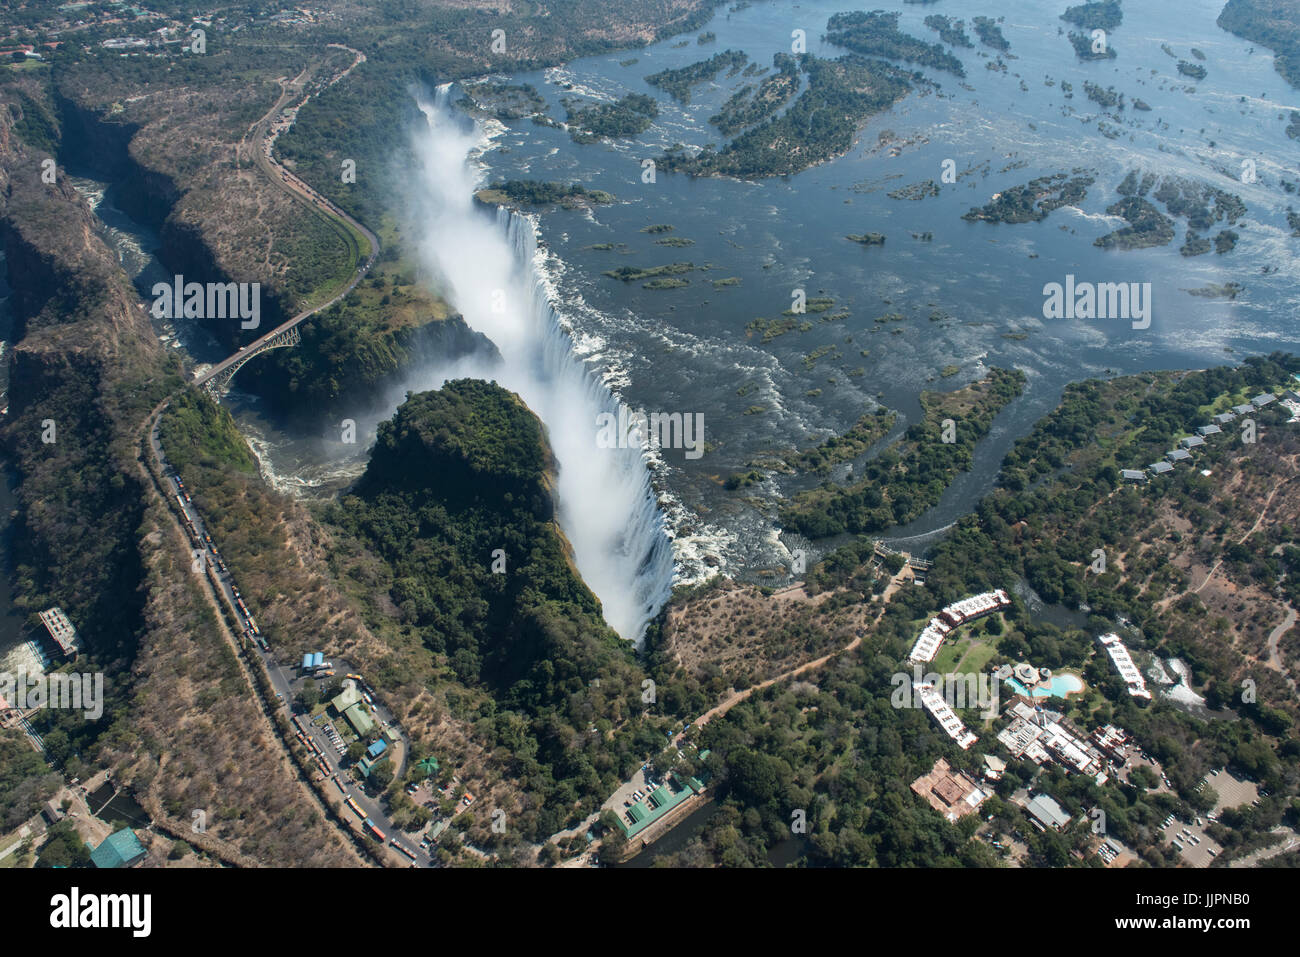 Southern Africa, at the border between Zambia and Zimbabwe. Livingston, Zambia and Victoria Falls, Zimbabwe. Aerial - Stock Image